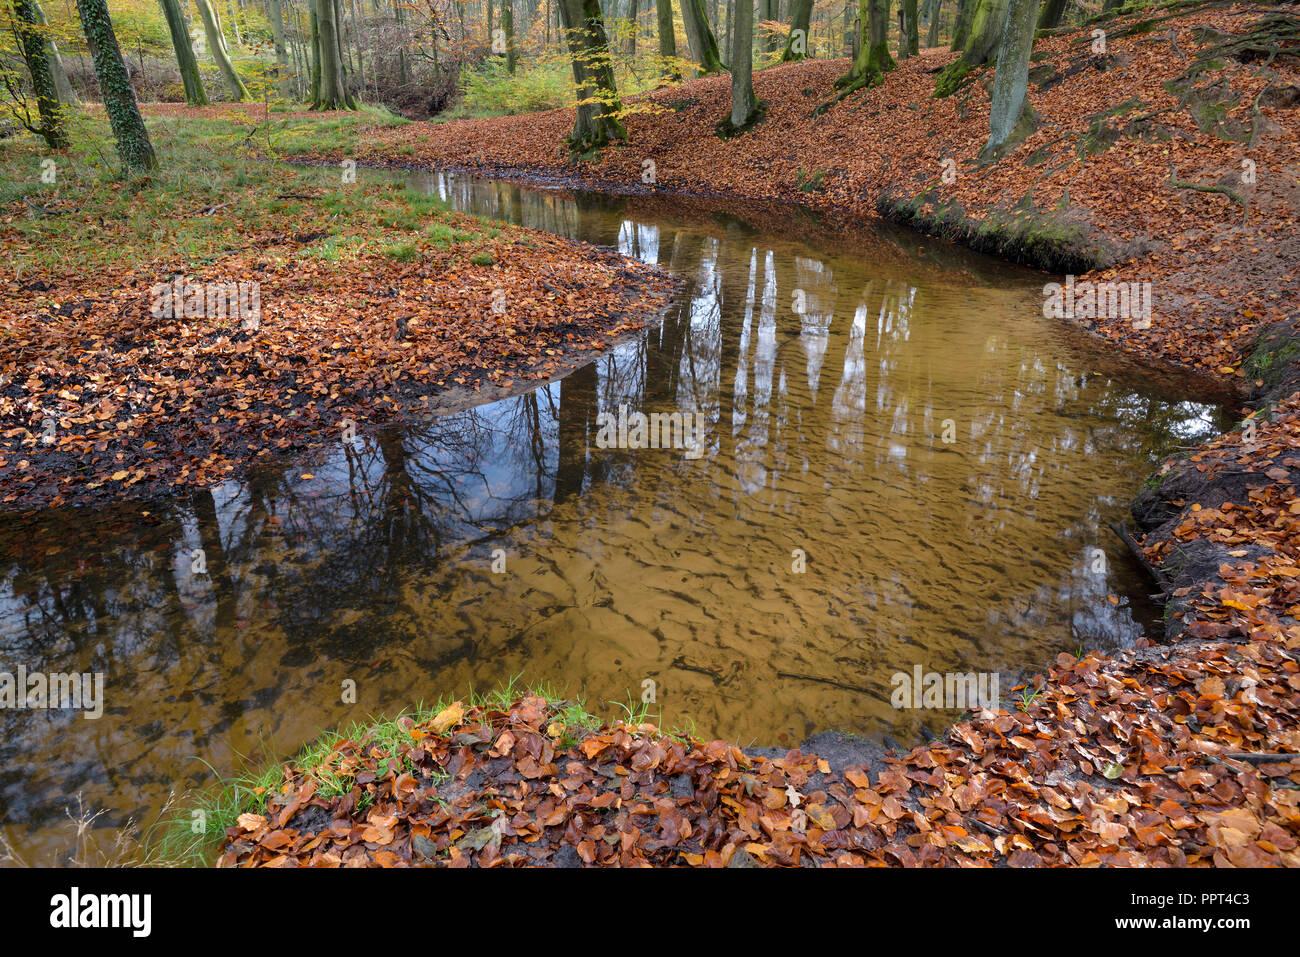 Rotbach, creek in beech forest, november, Oberhausen, Germany - Stock Image